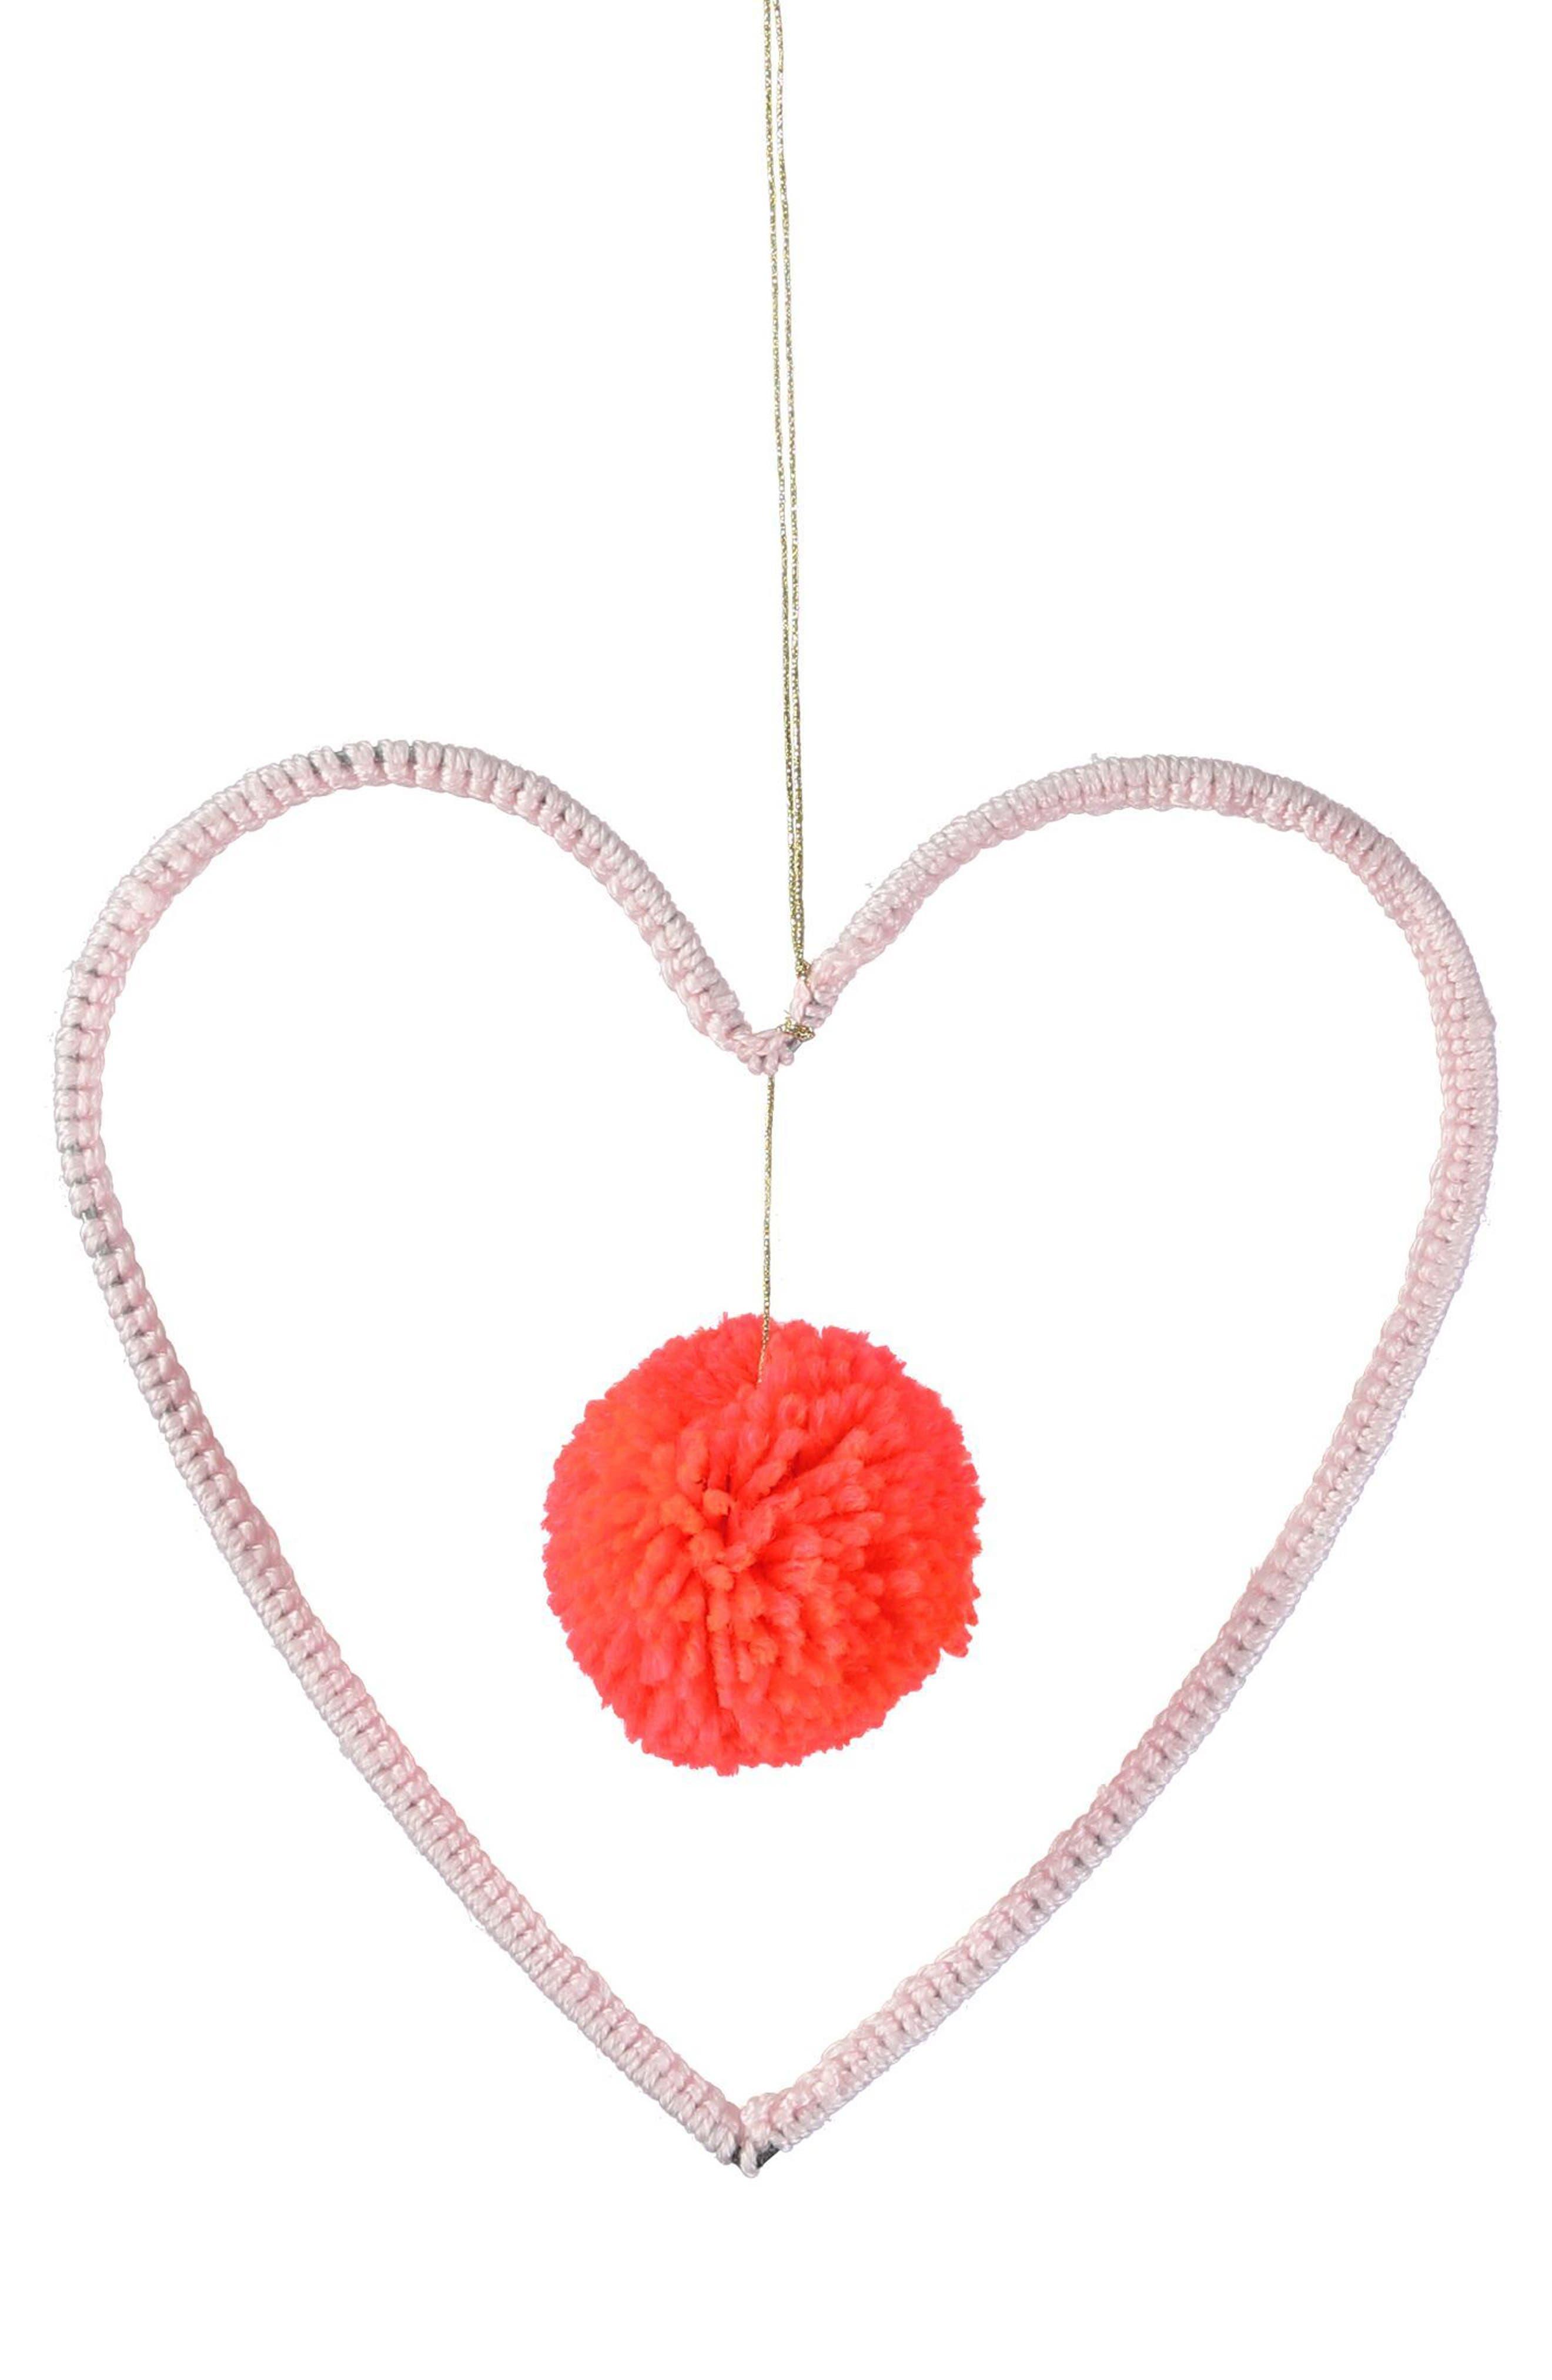 Meri Meri Hanging Heart & Pom Wall Art